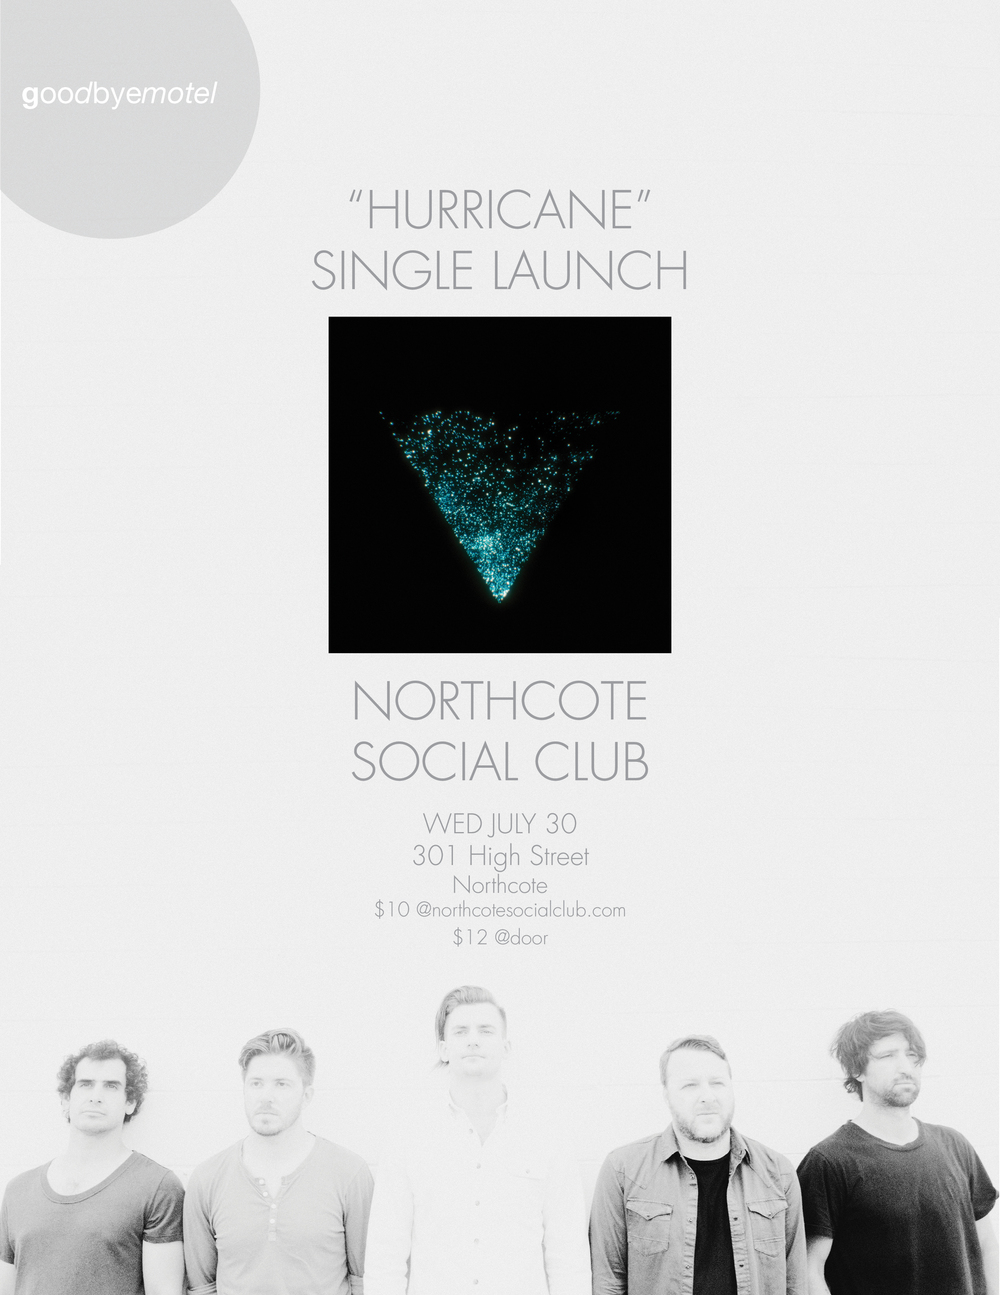 Northcote Social Club - Hurricane Single Poster - 30th July 2014.jpeg